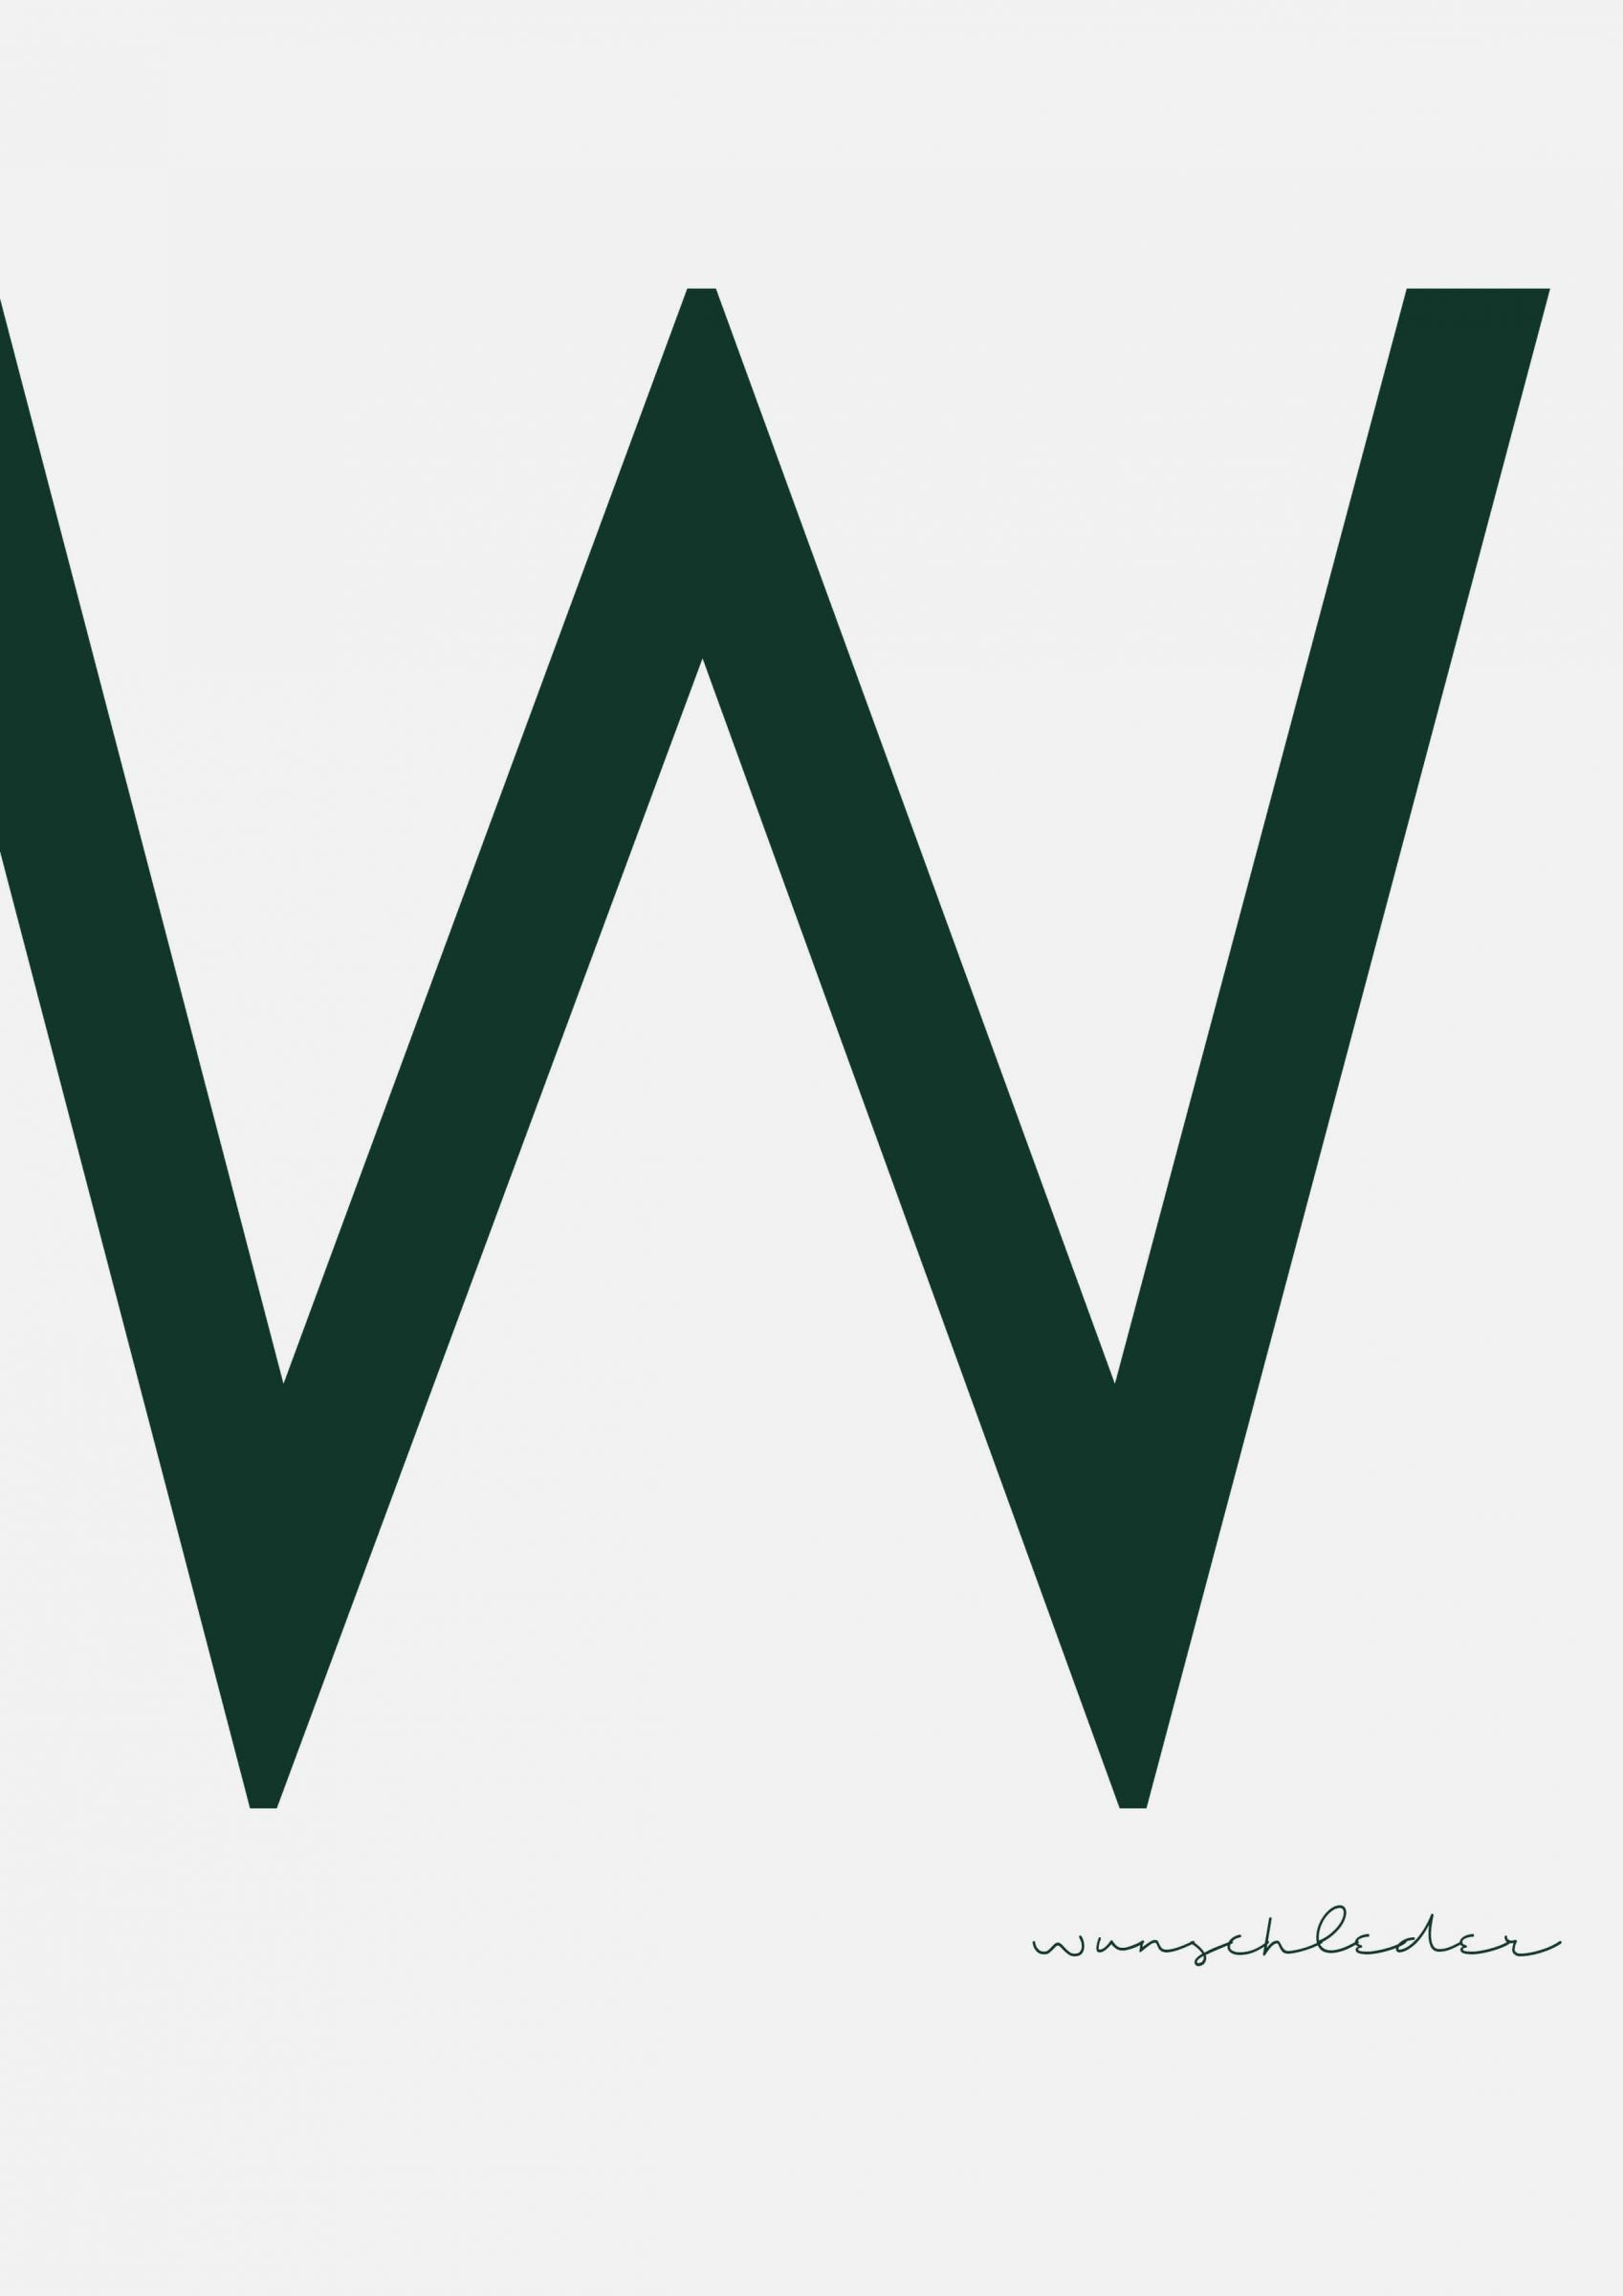 7 free Handlettering Fonts | free Download | Handlettering Schriftarten | Turnbeutel | Graphic Design | Typography | Fonts | Quote | Inspiration